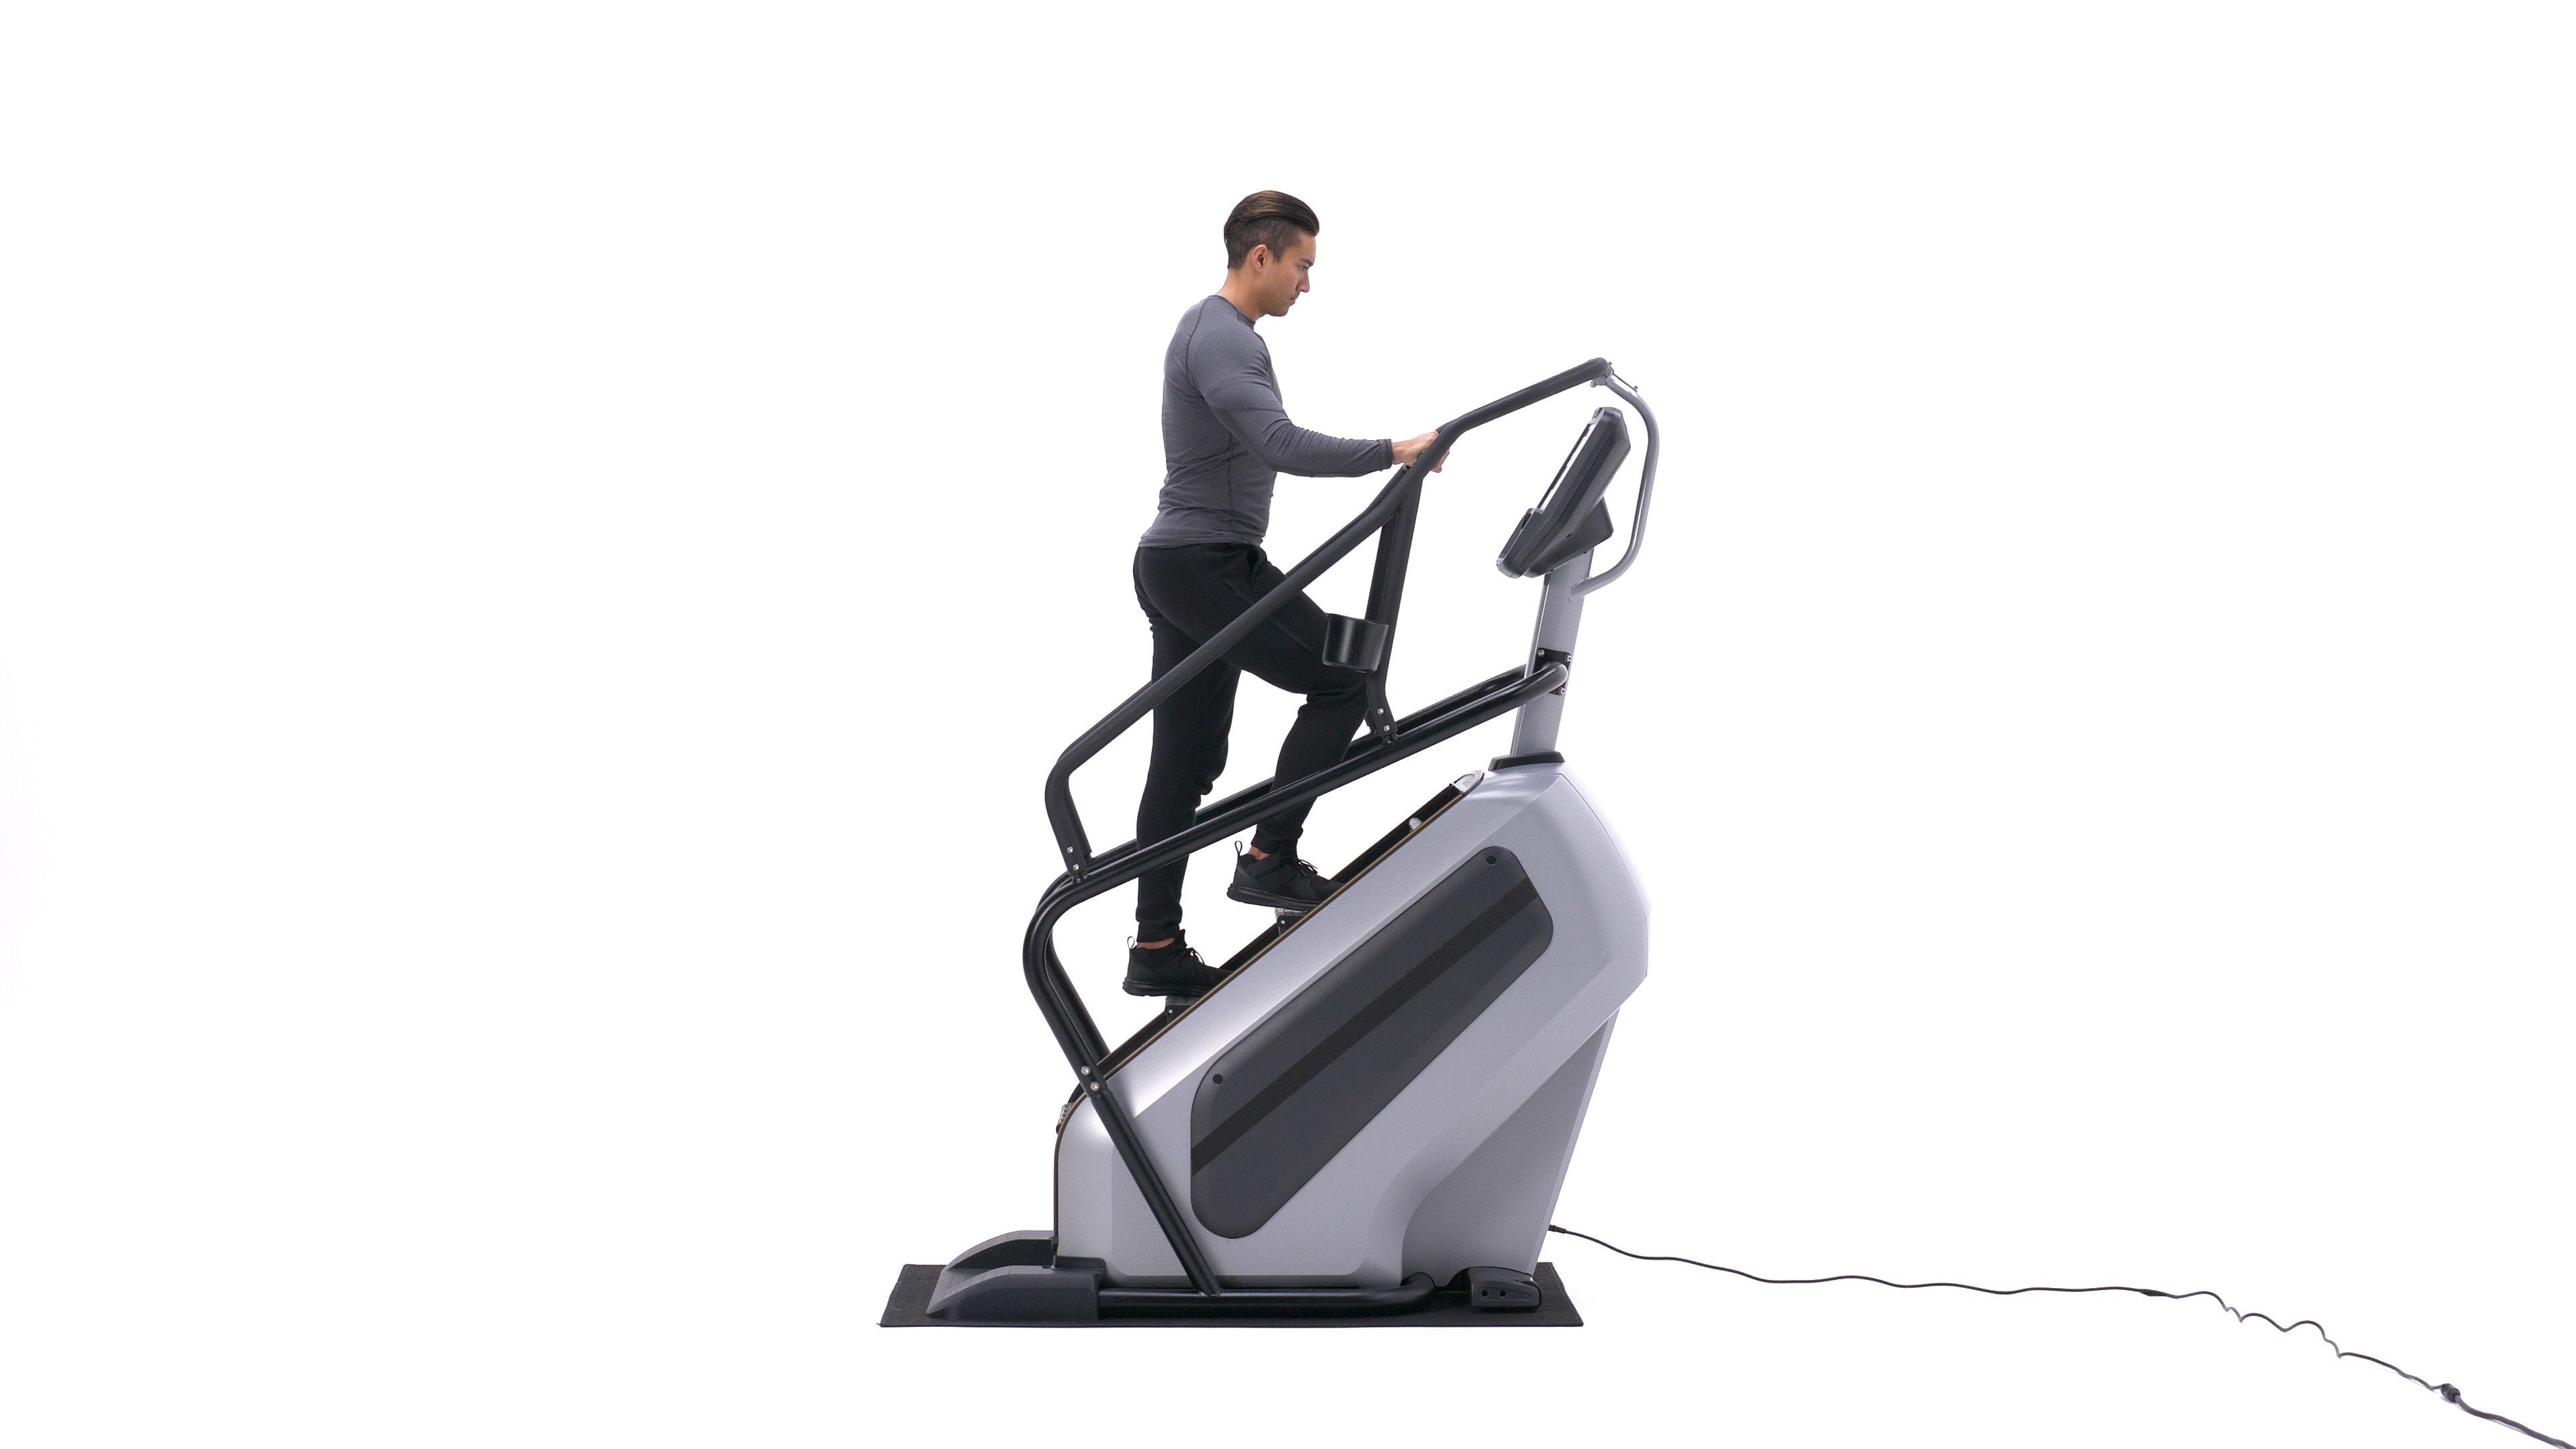 Stair climber image